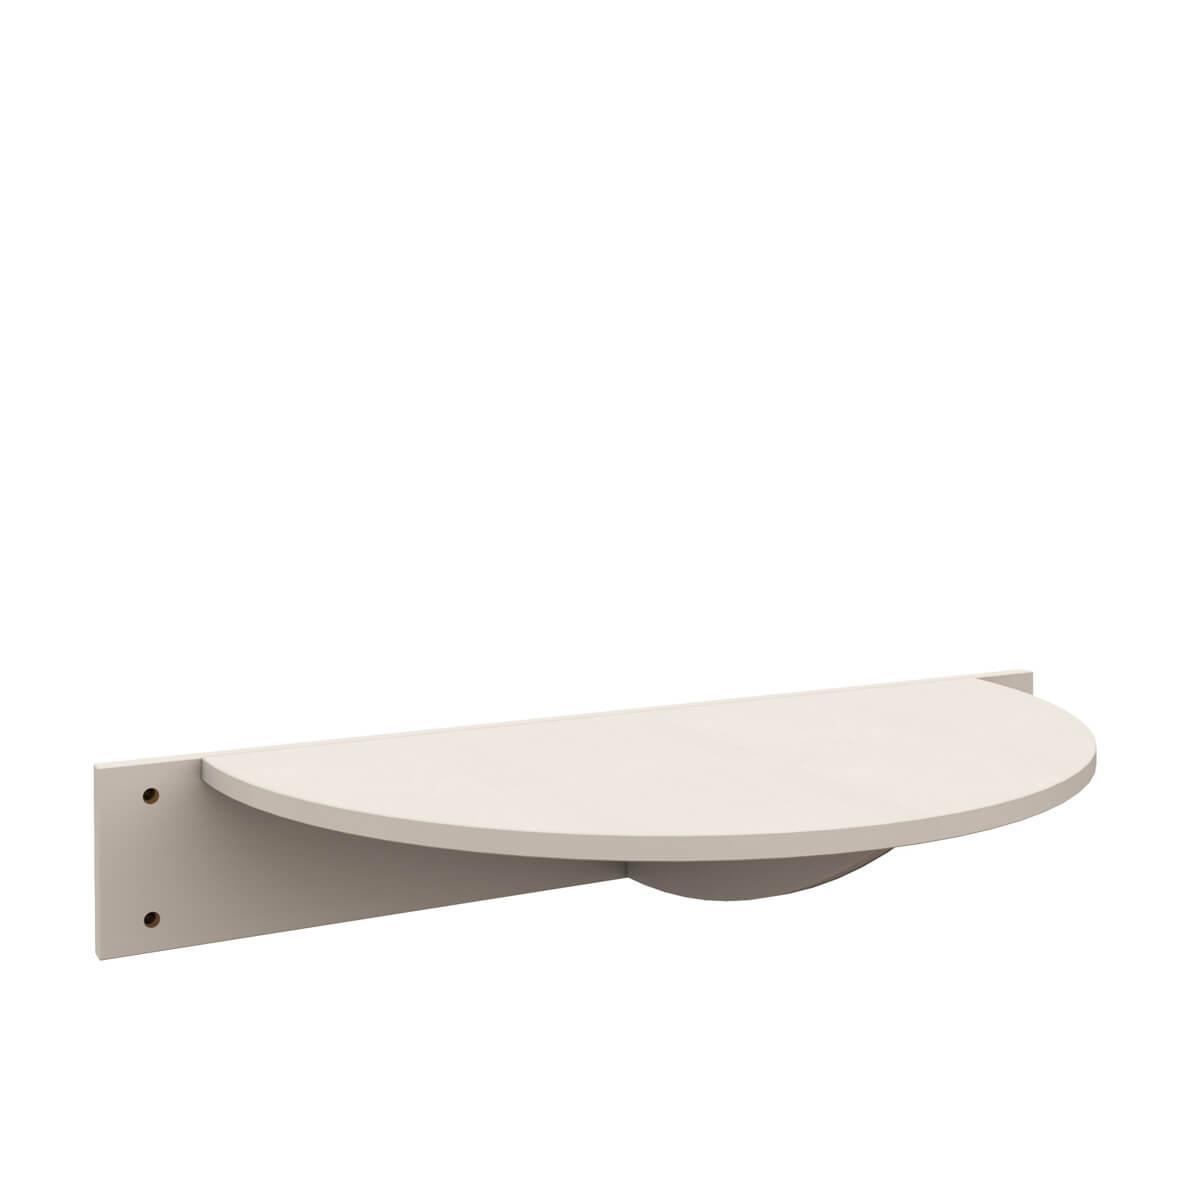 Mesita cama DESTYLE de Breuyn haya blanco